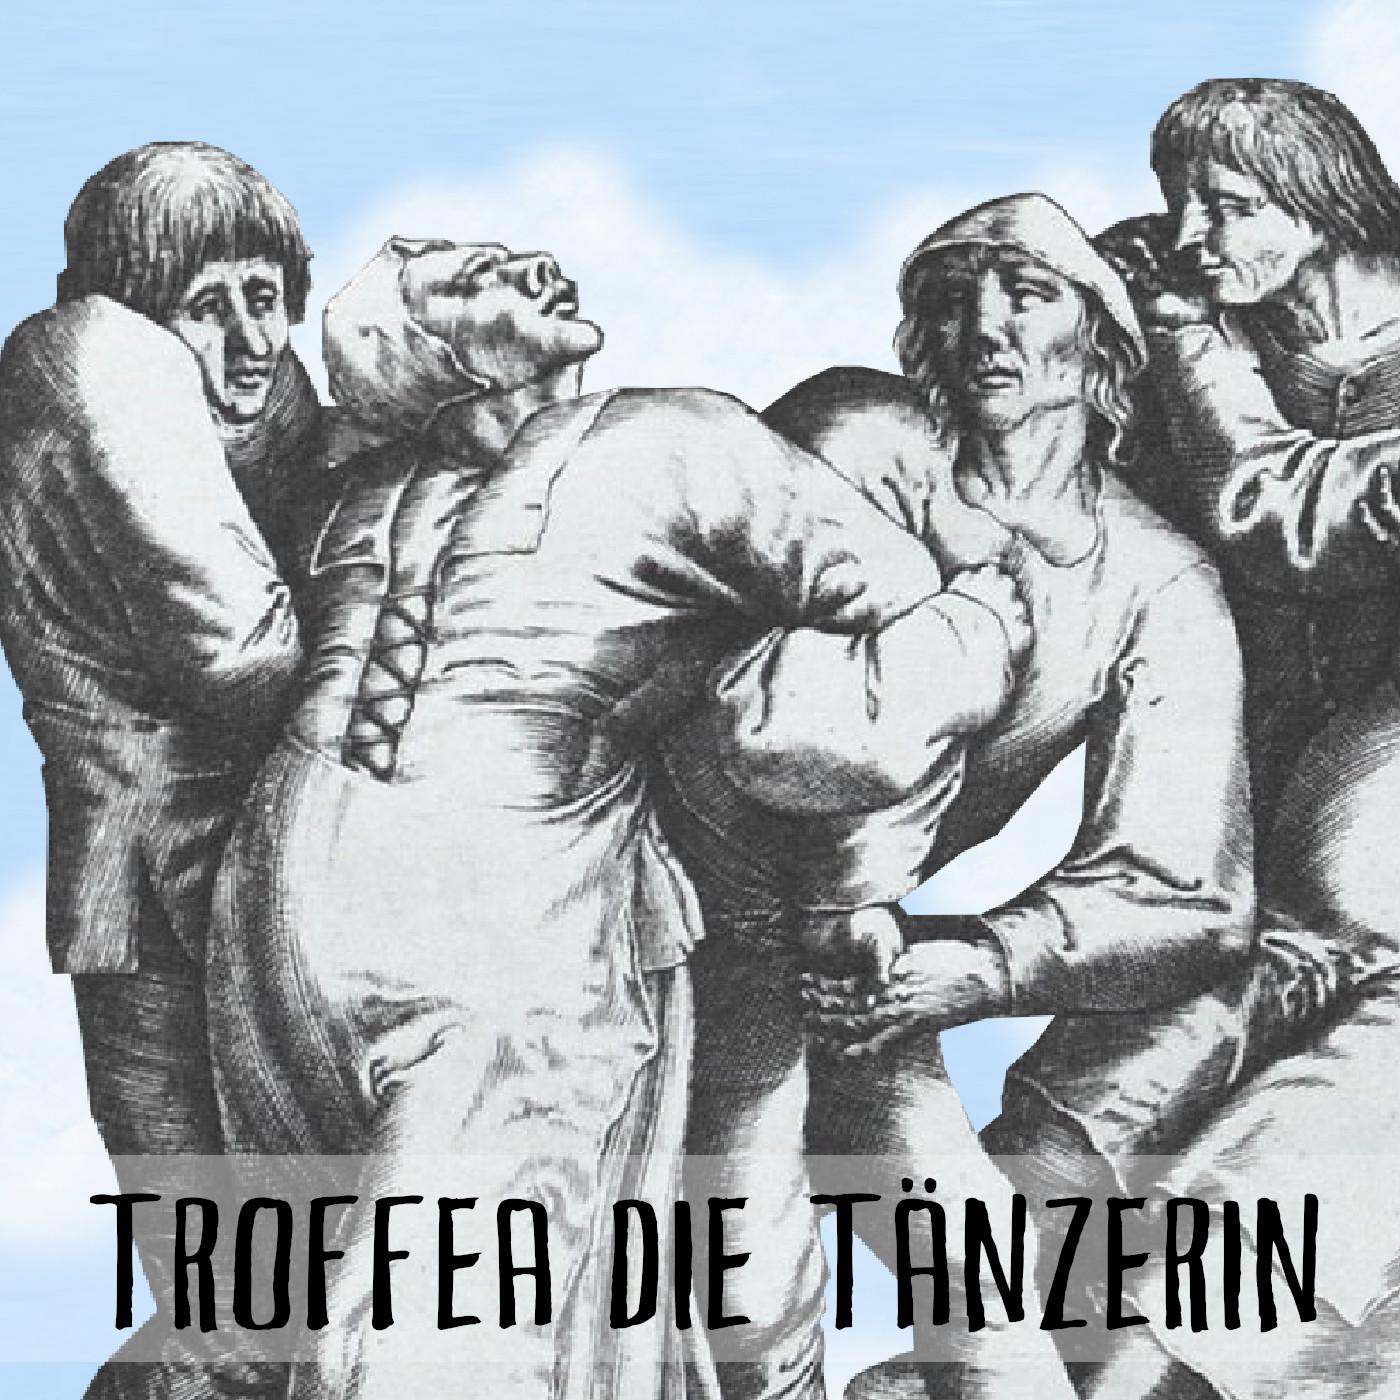 Podcast Cover: Old painting of a dancing crowd in Alsace during the dancing plague. Podcast Logo: Altes Gemälde einer tanzenden Menschengruppe im Elsass während der Tanzwut.